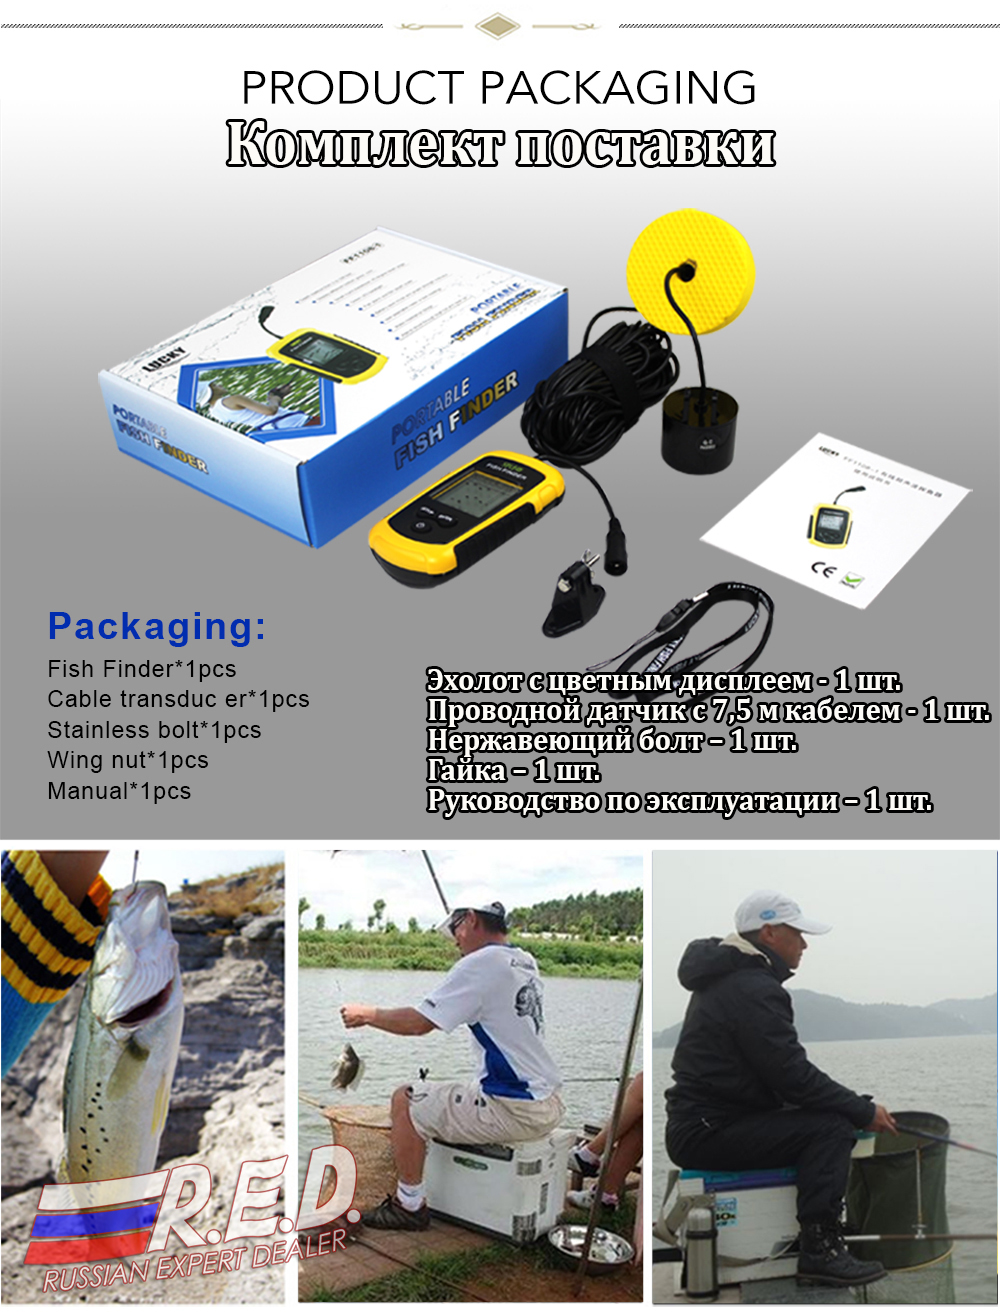 High Quality portable sonar